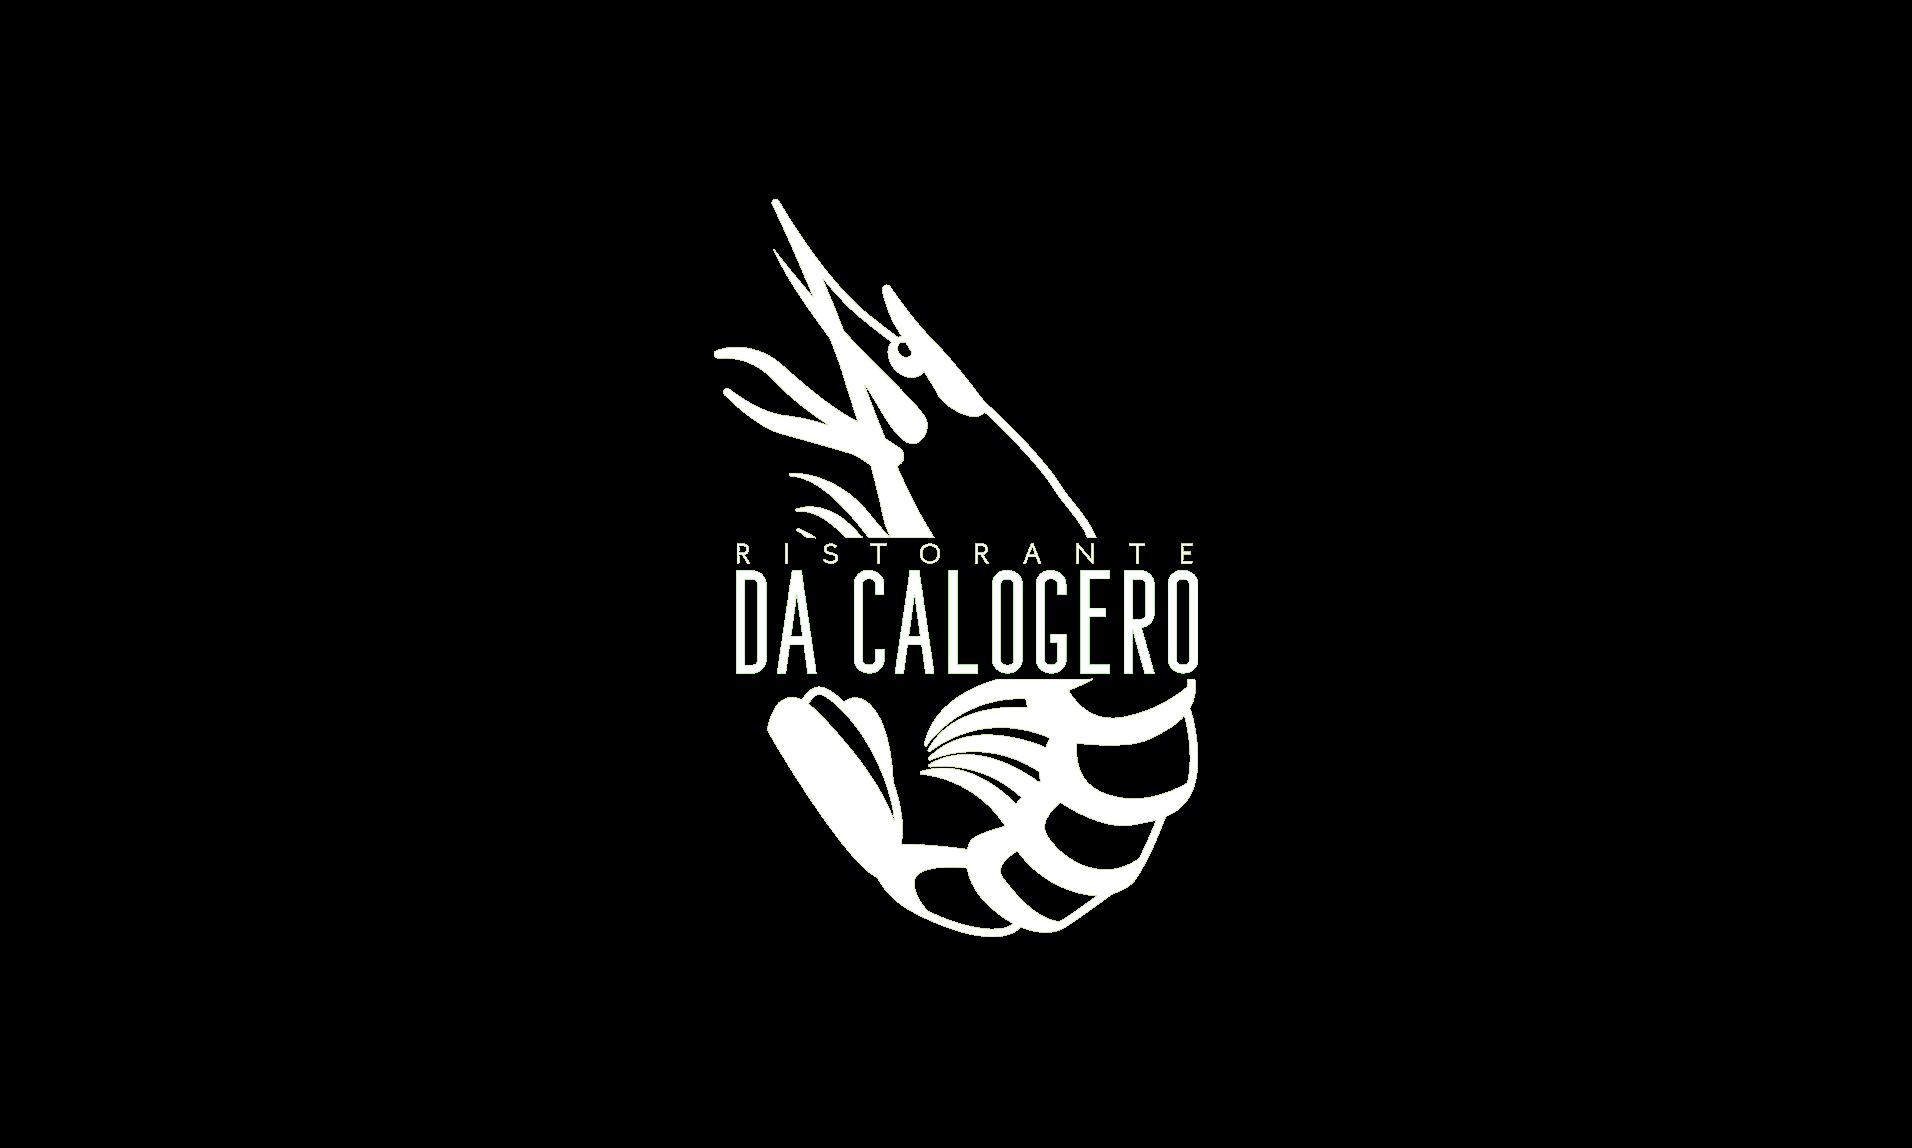 Da Calogero